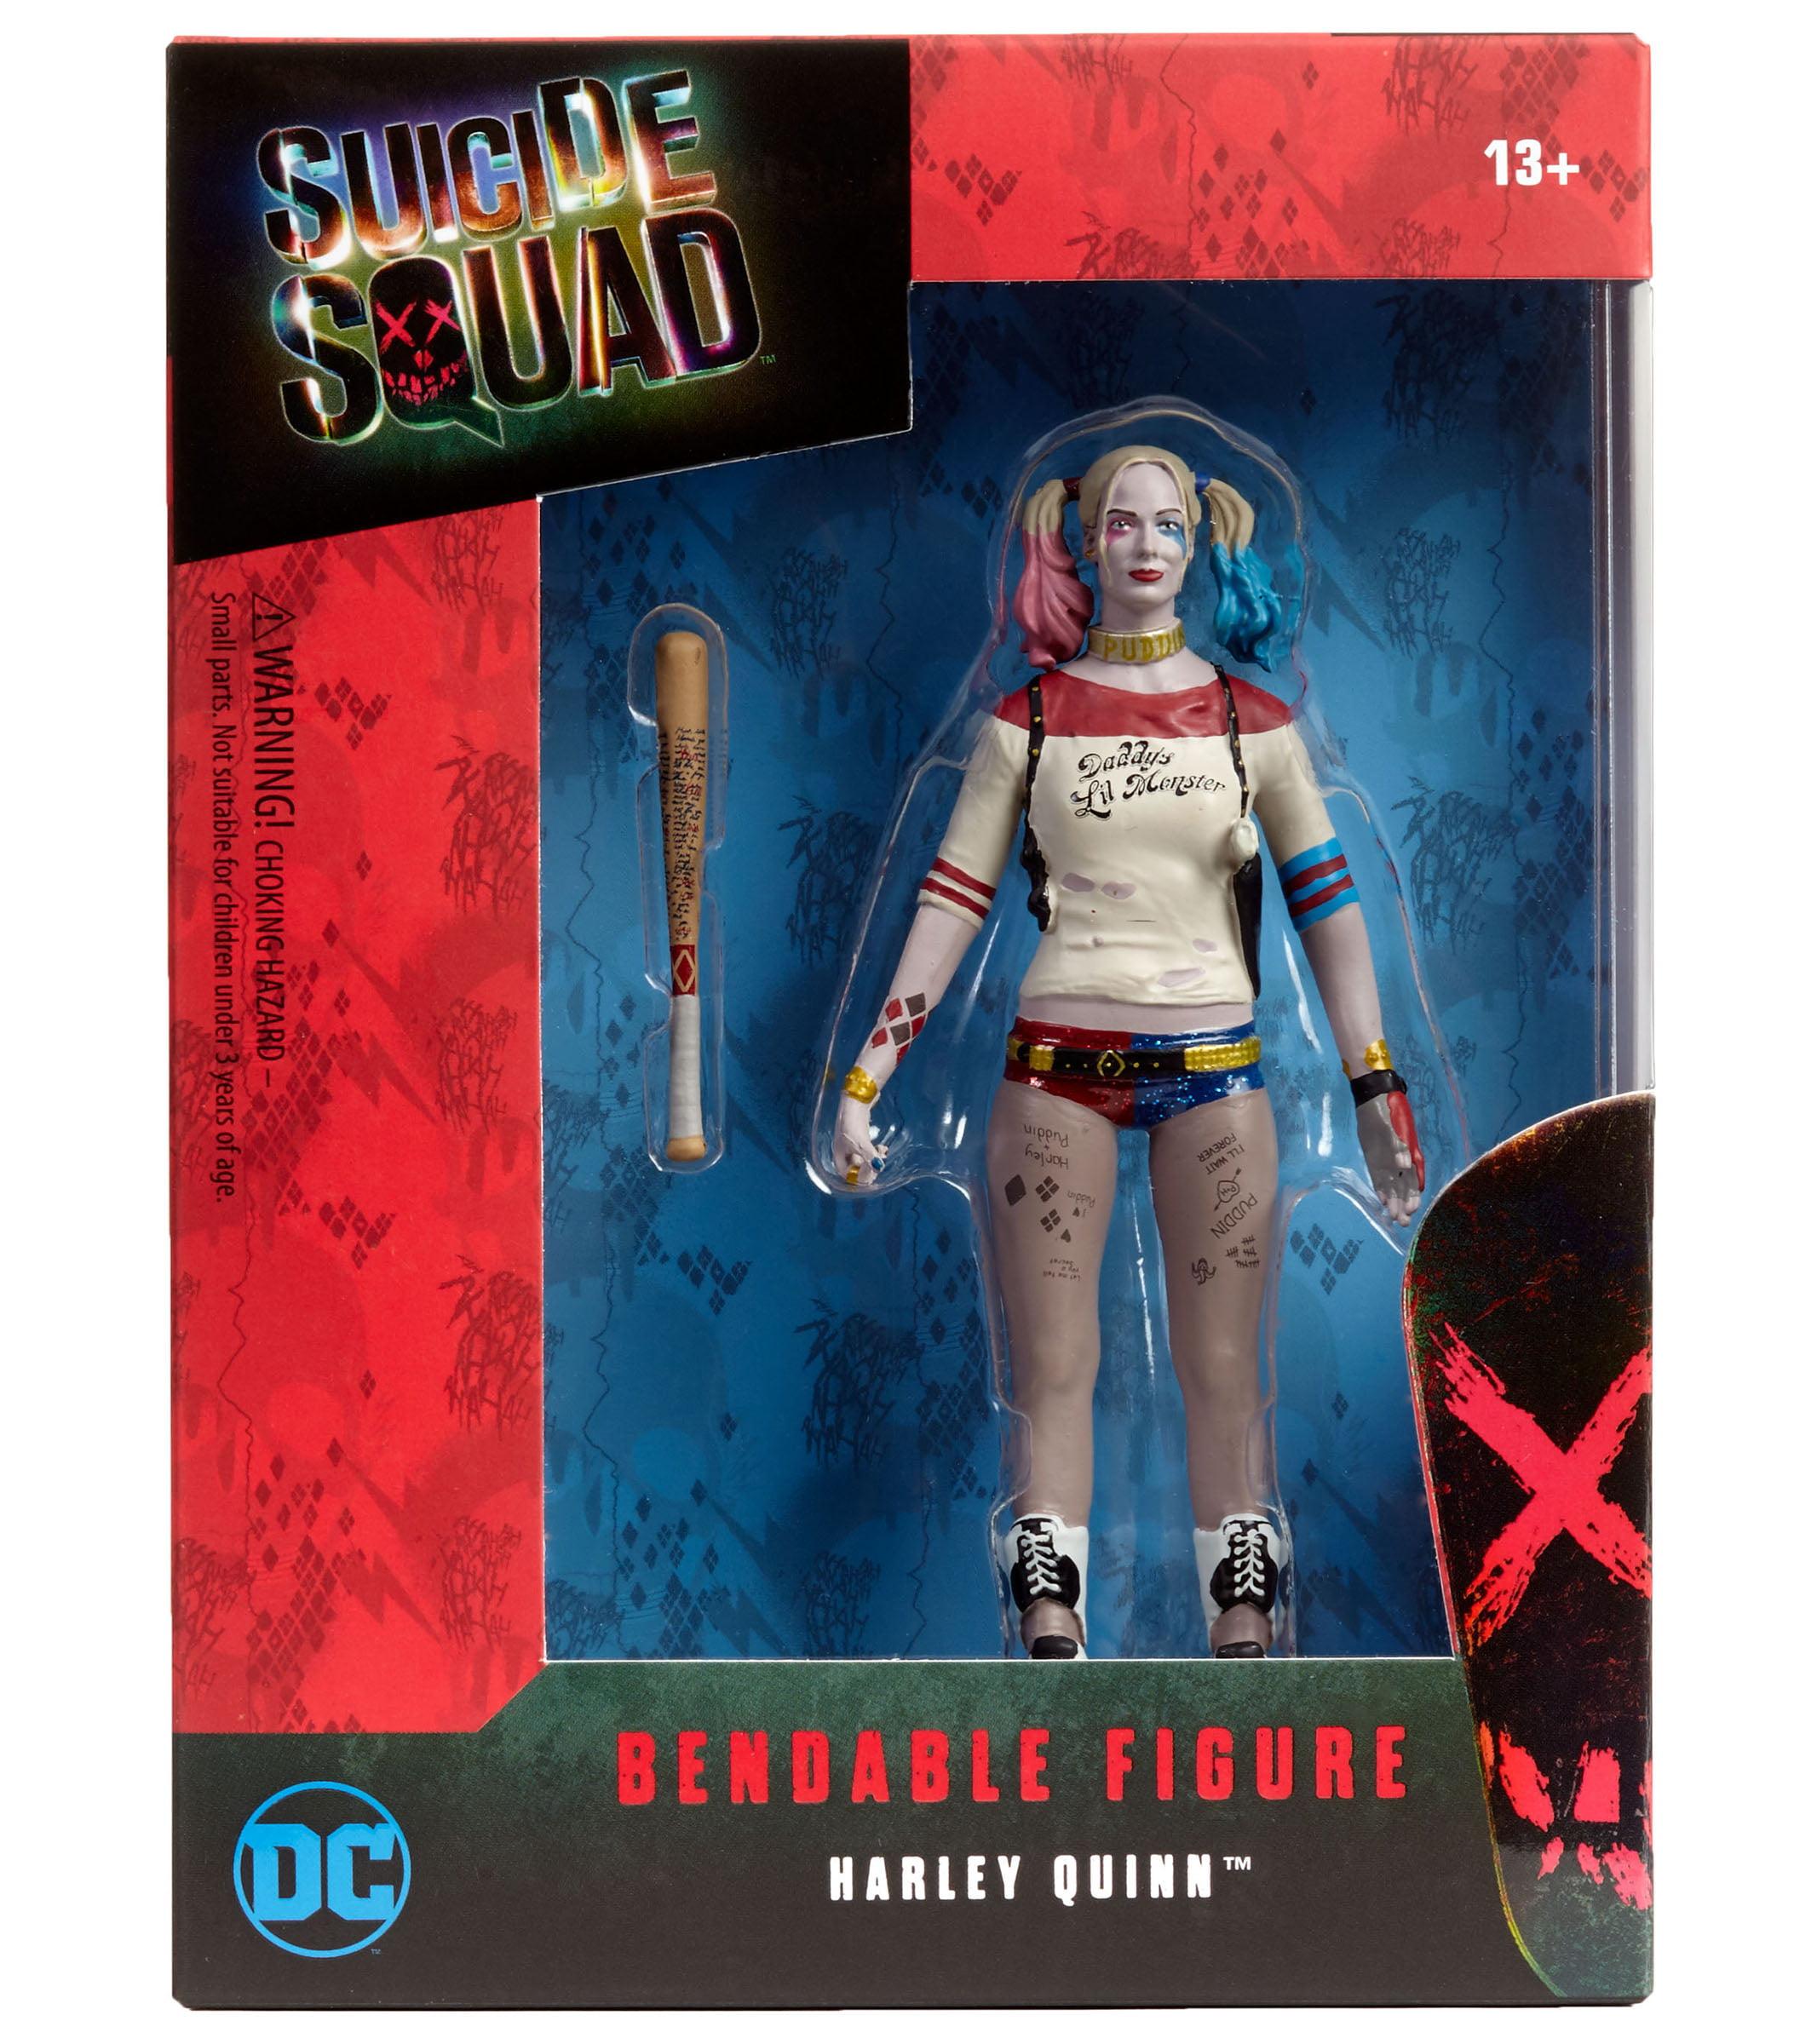 DC Comics Suicide Squad Harley Quinn Bendable Figure by NJ Croce